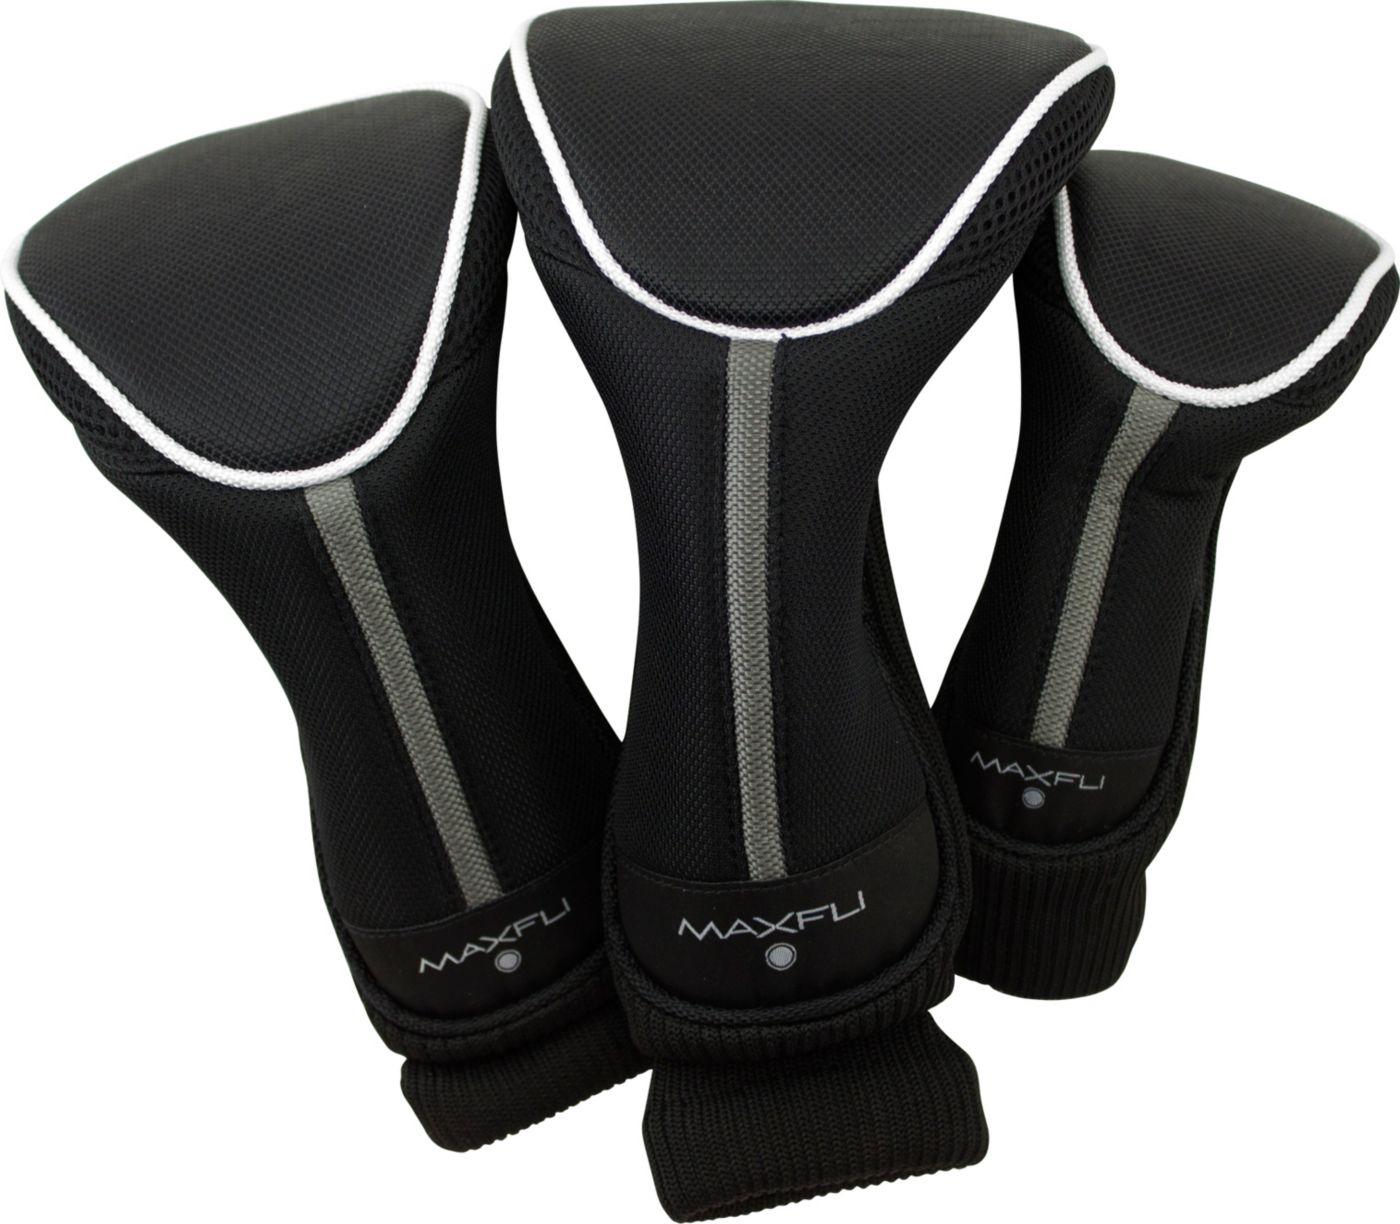 Maxfli Black/Blue Headcovers - 3 Pack